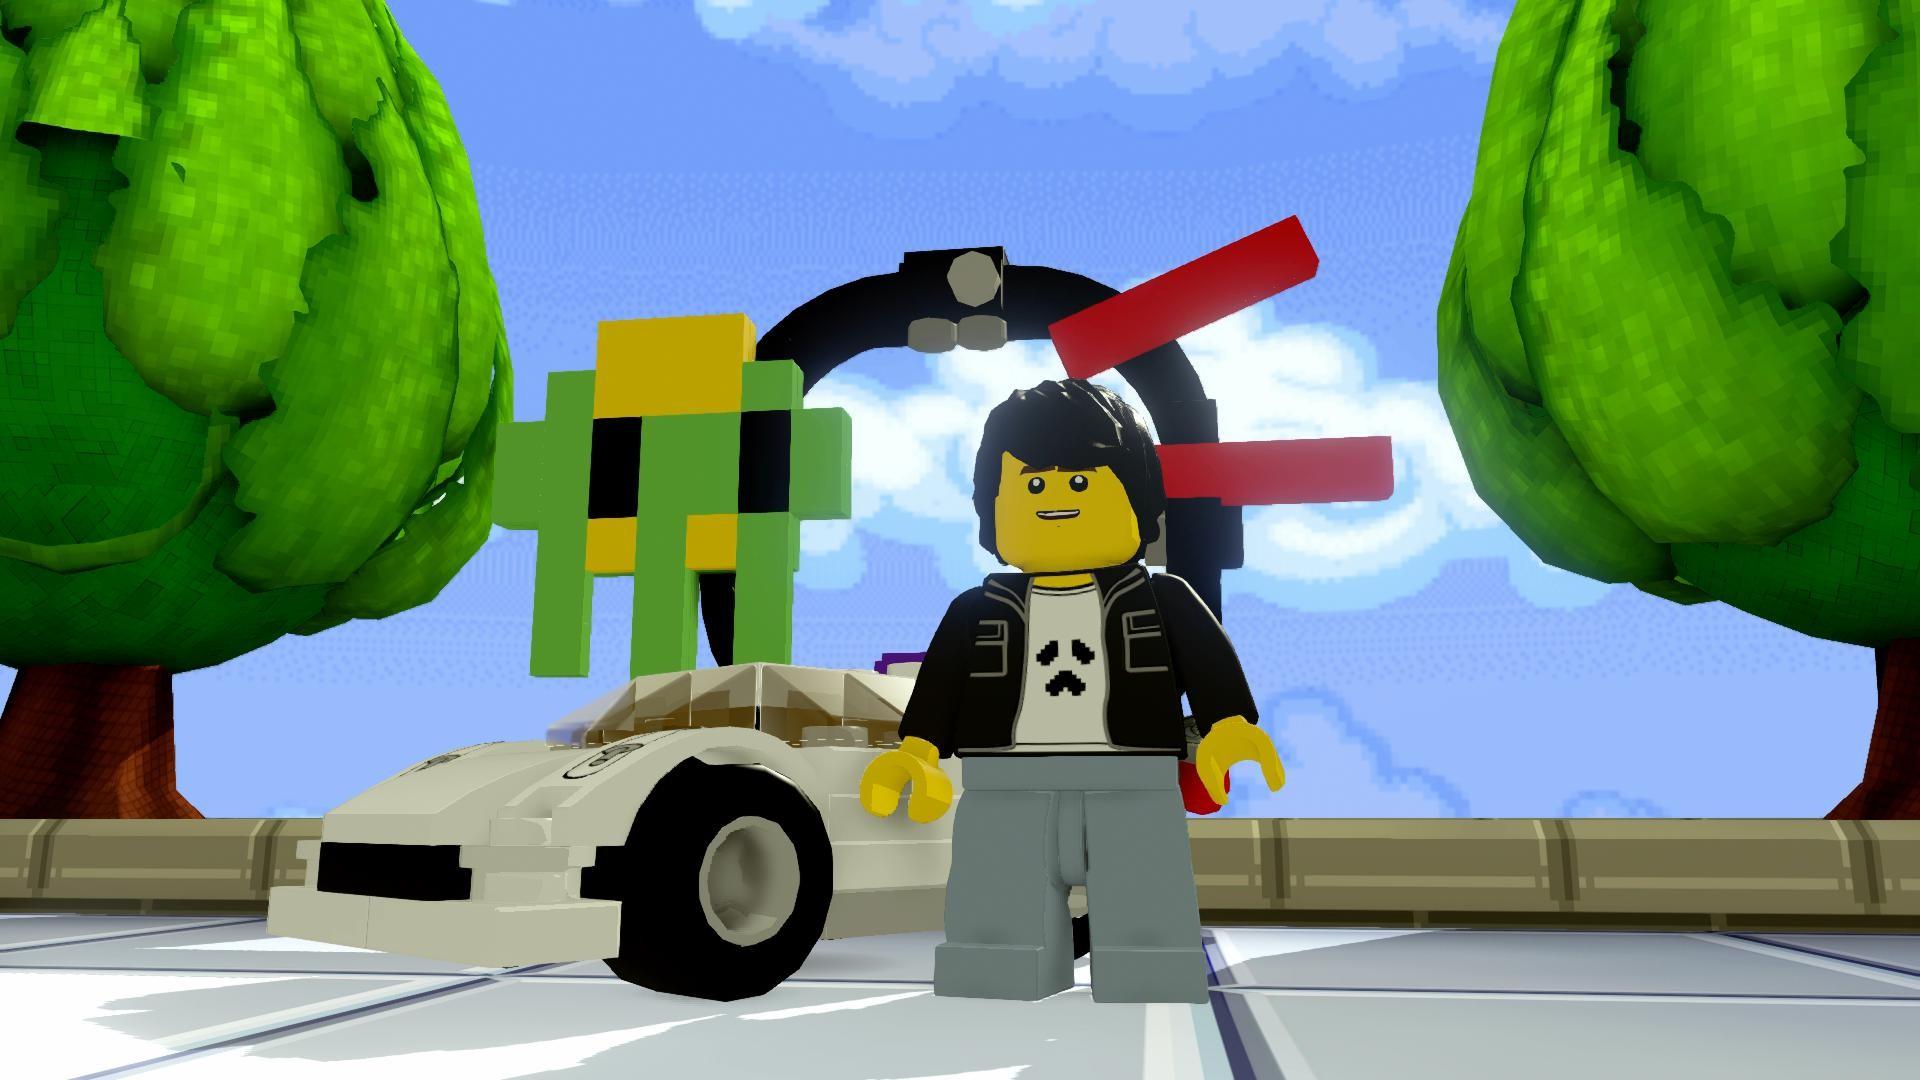 LEGO_Dimensions_Gamer_Kid_14_bmp_jpgcopy